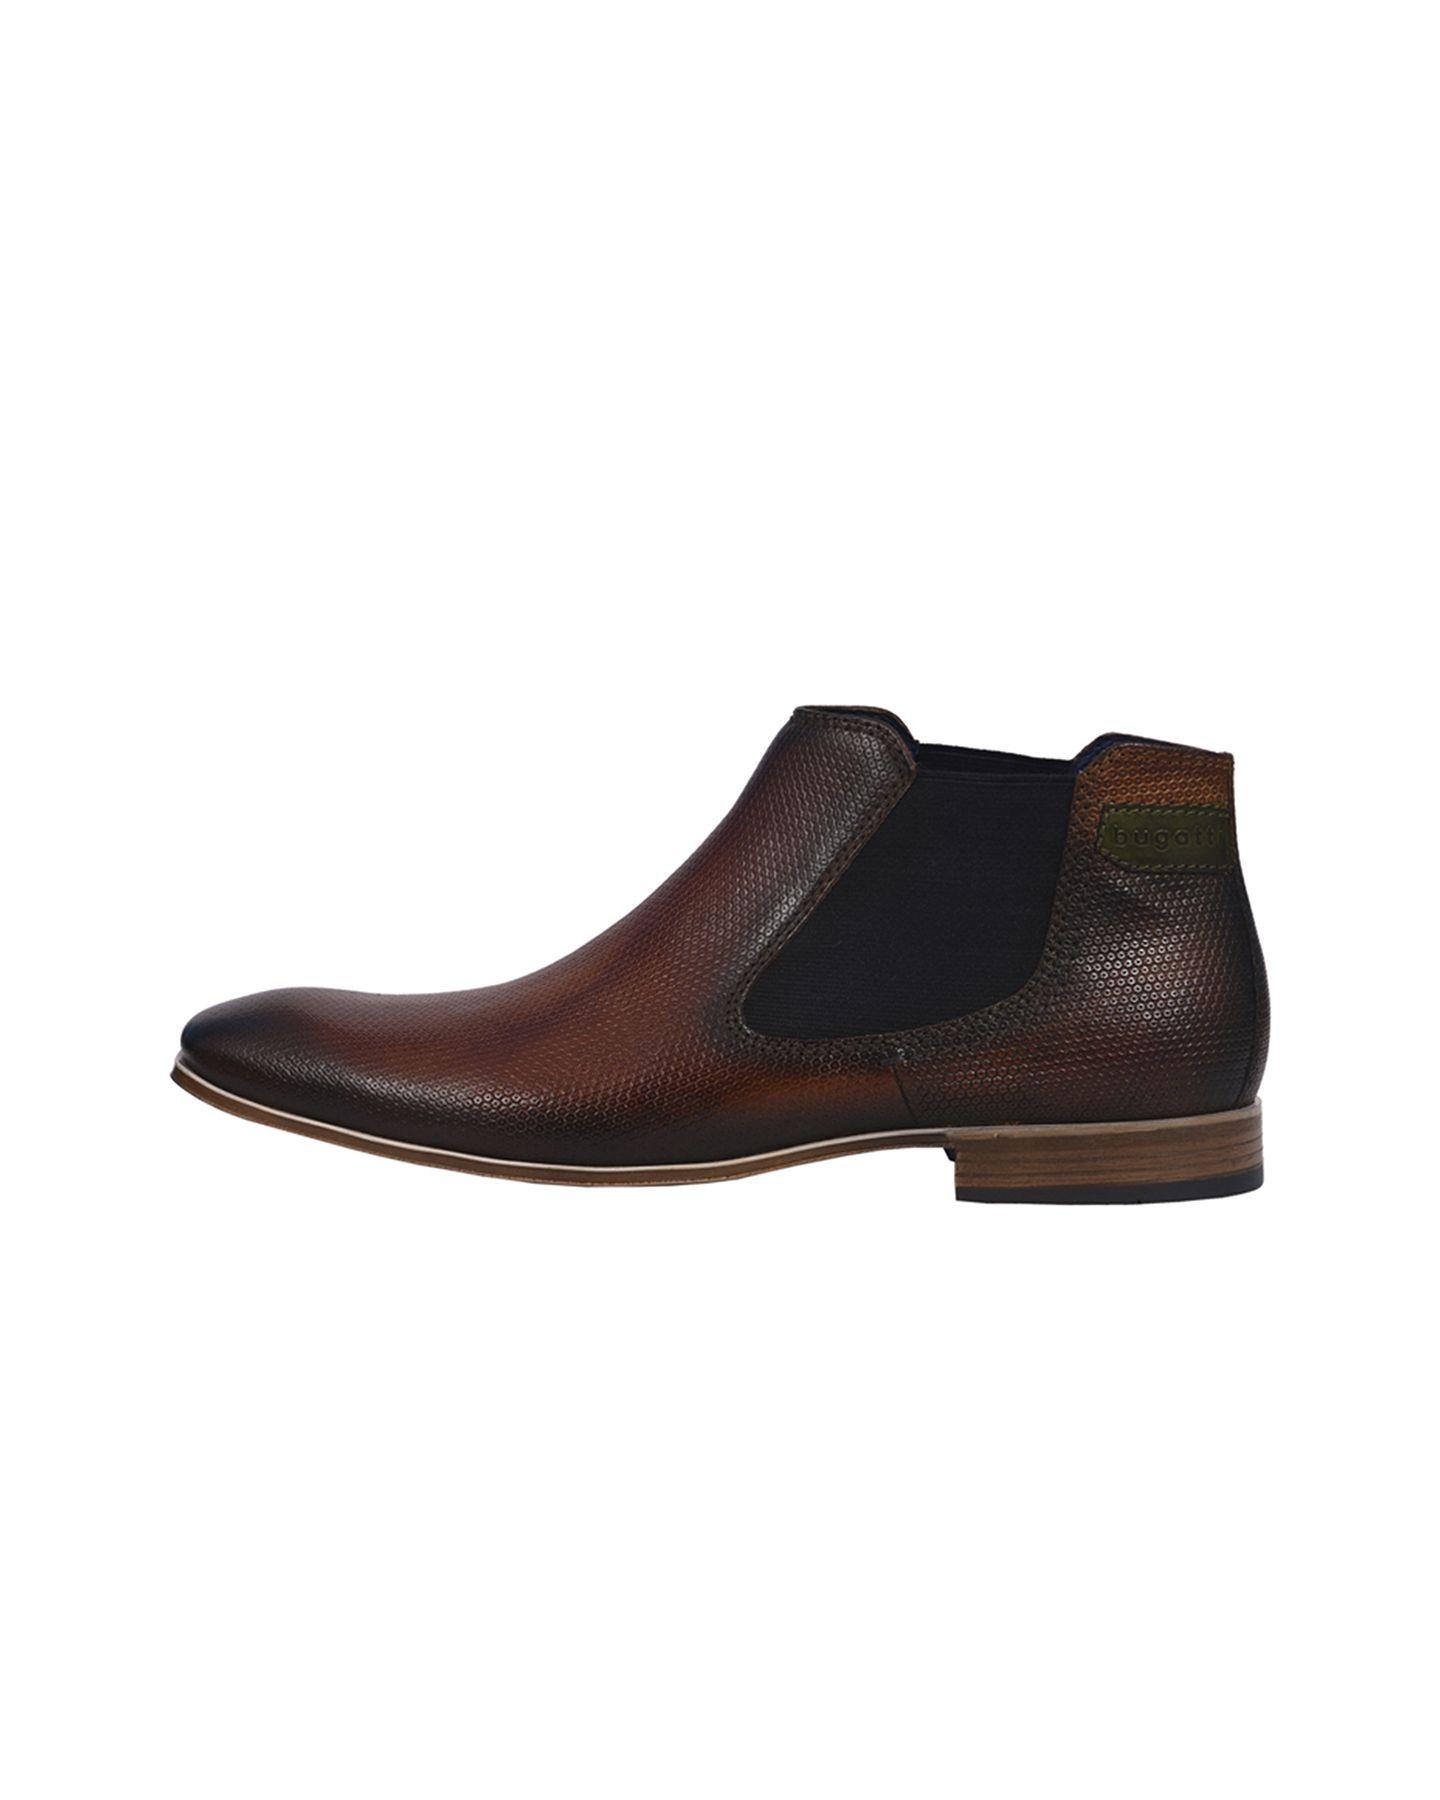 bugatti Chelsea boots in cognac in Größe 46